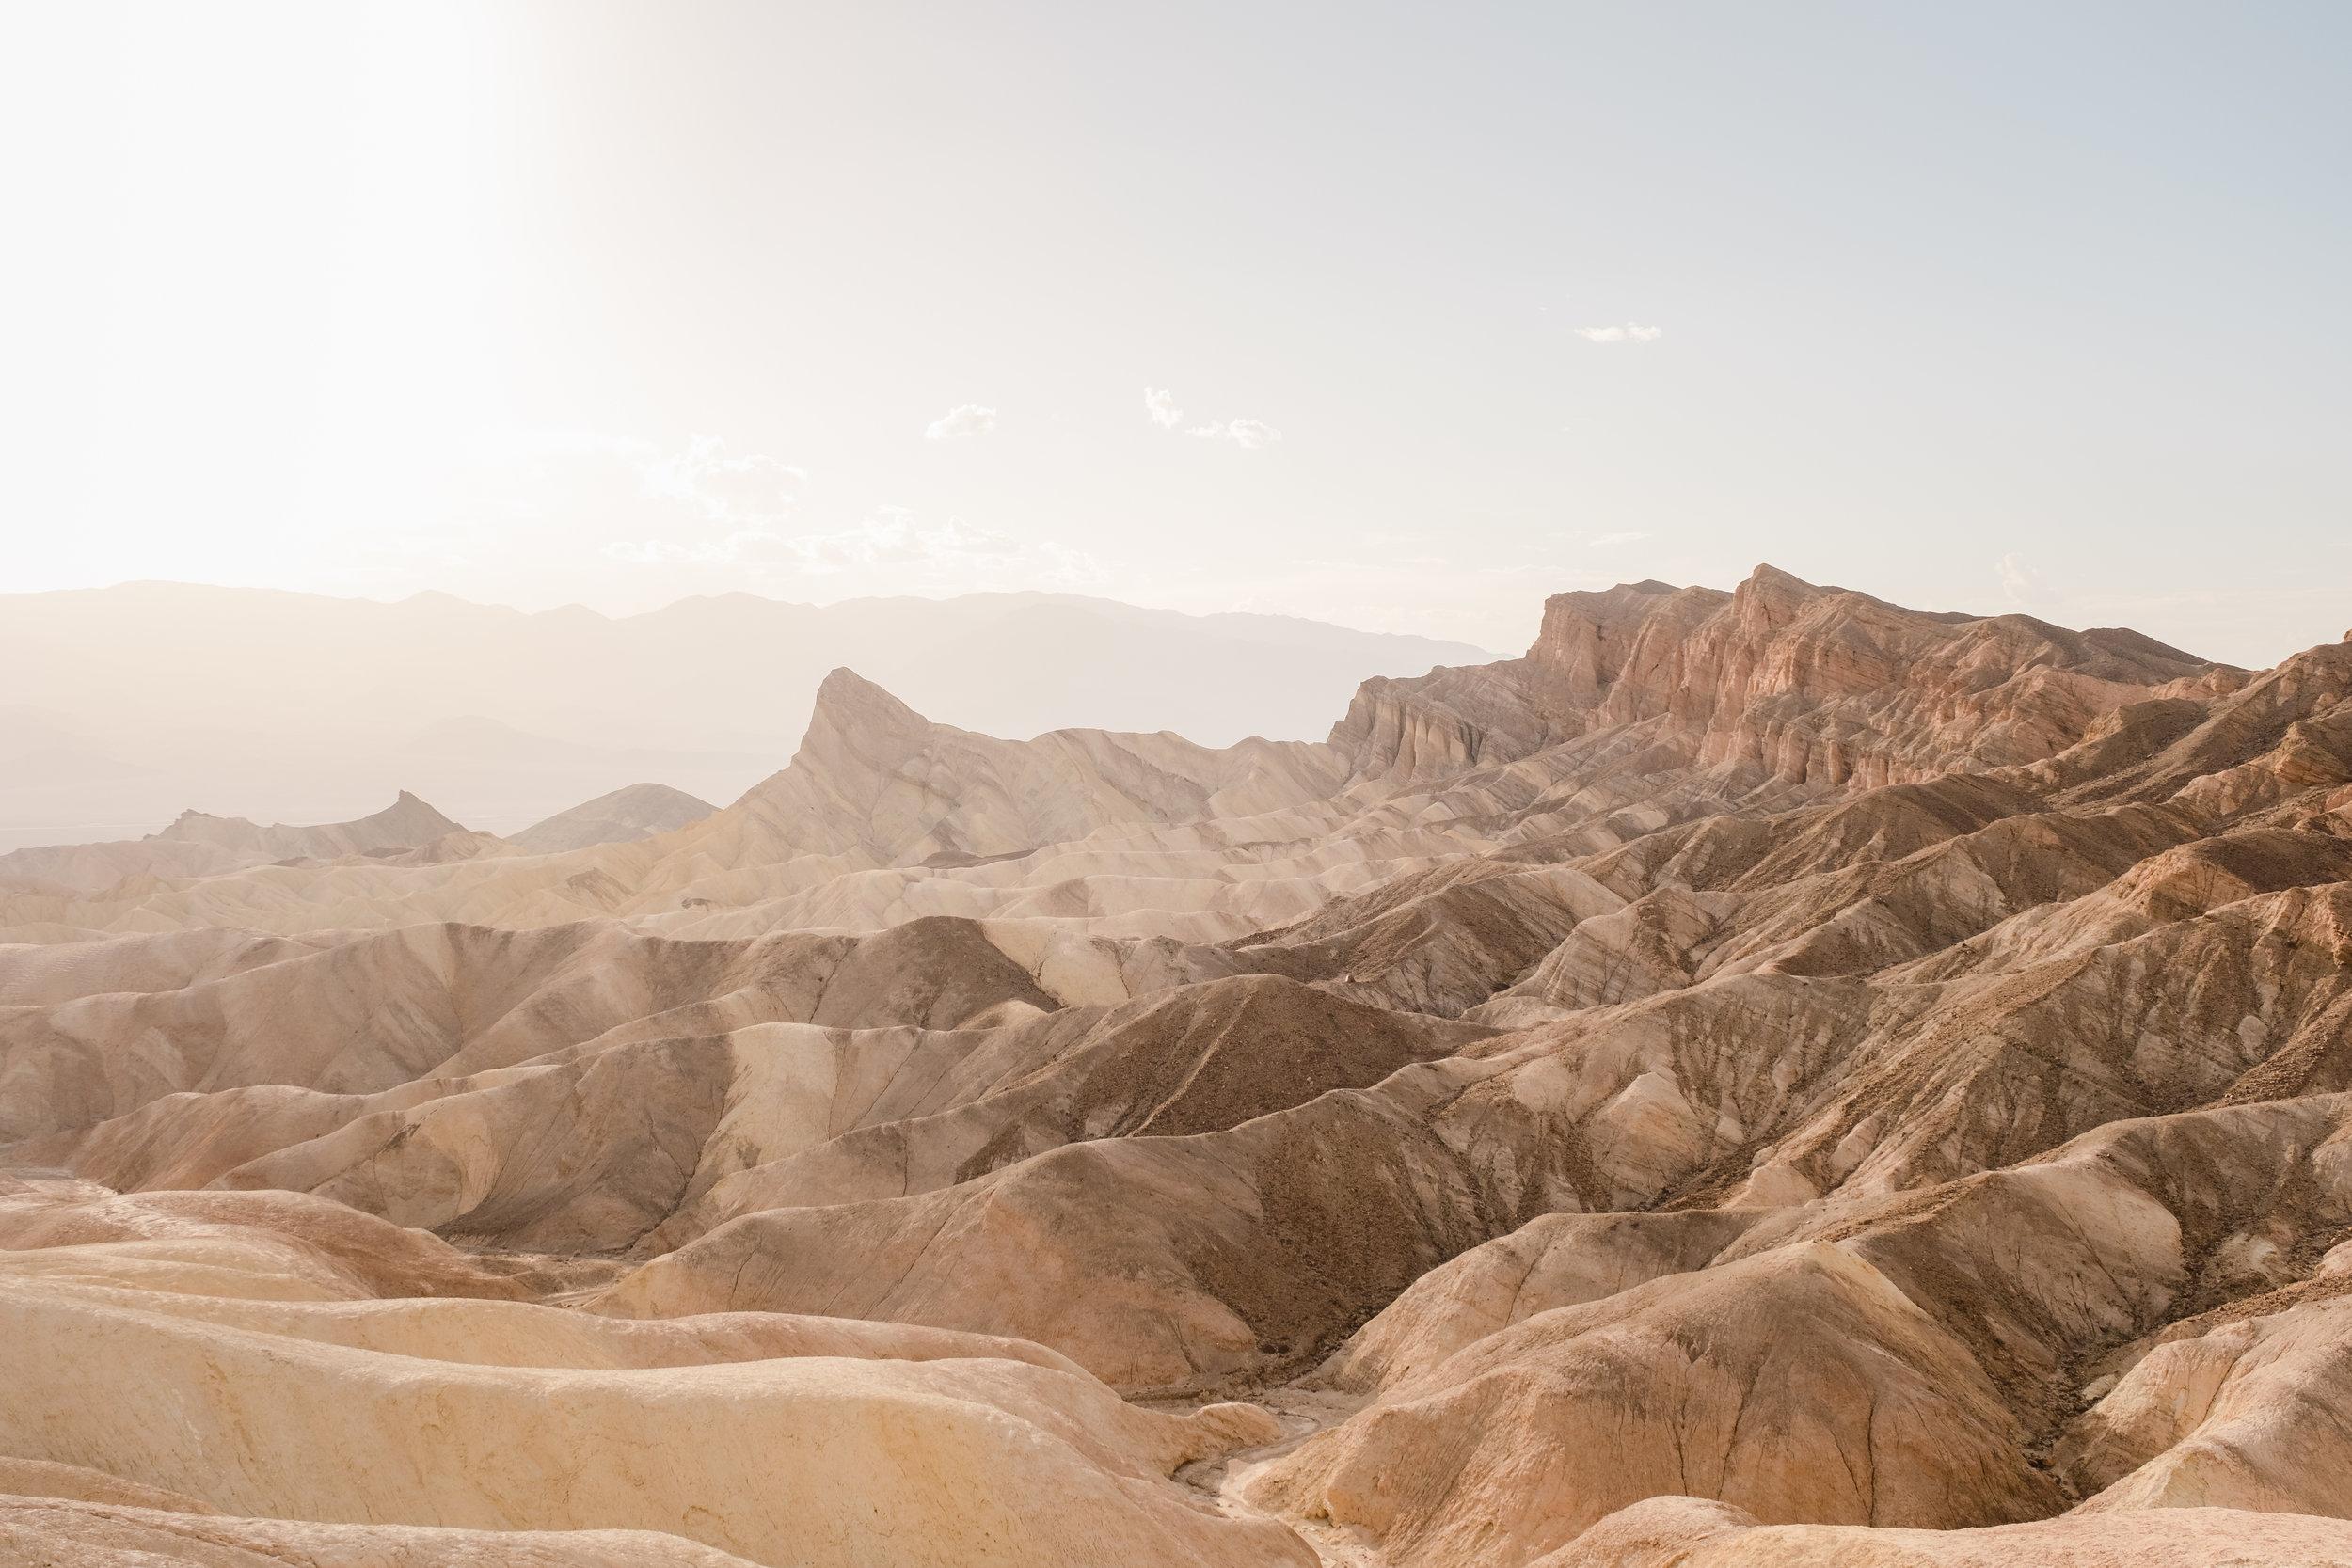 Death_Valley_National_Park4.jpg